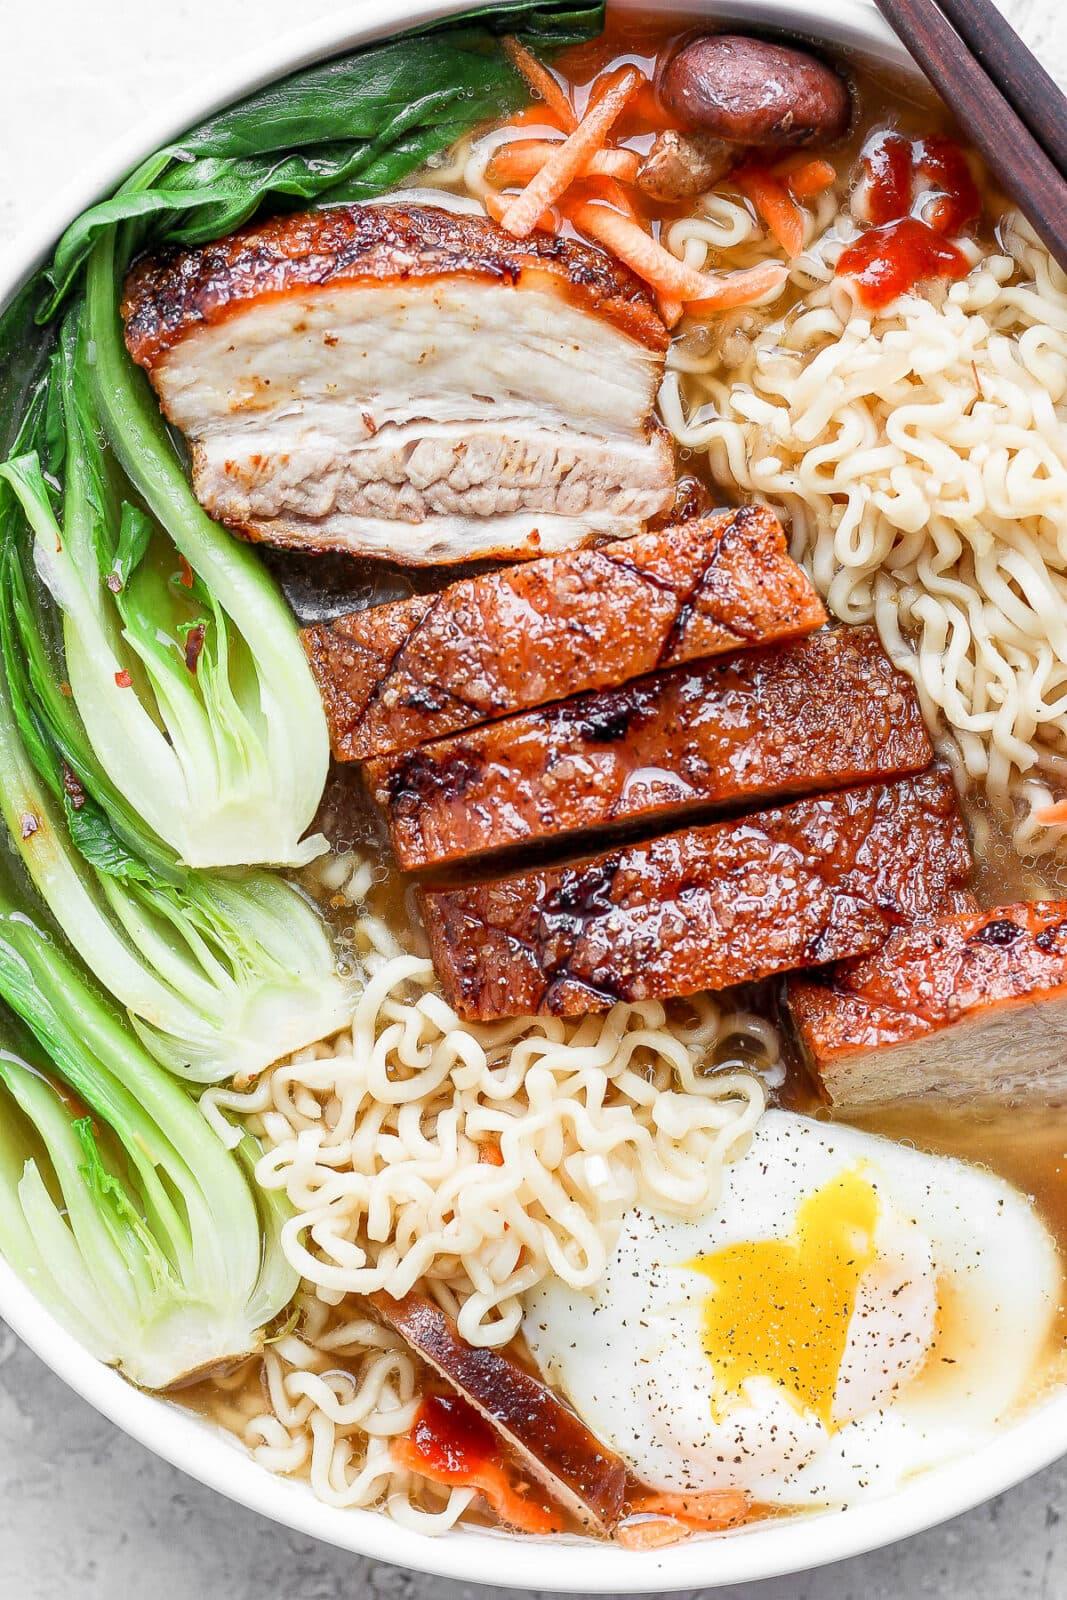 Pork belly ramen in a bowl with chopsticks.